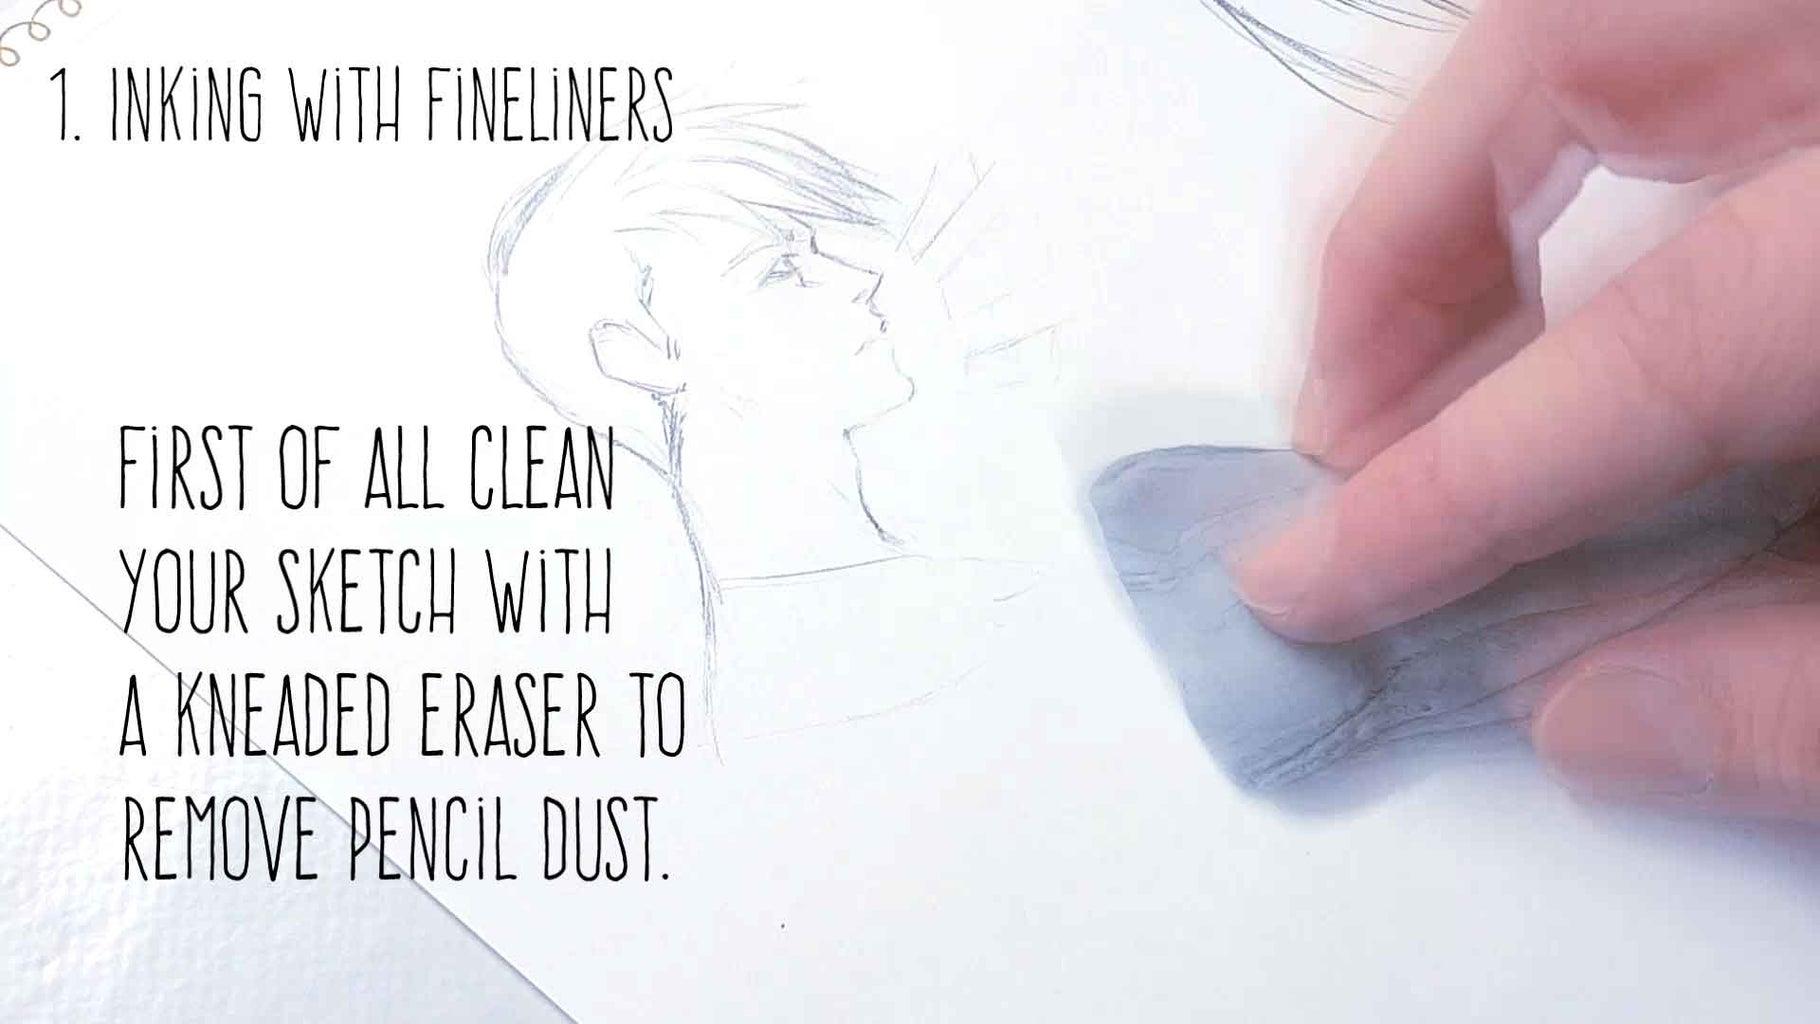 1) Fineliners